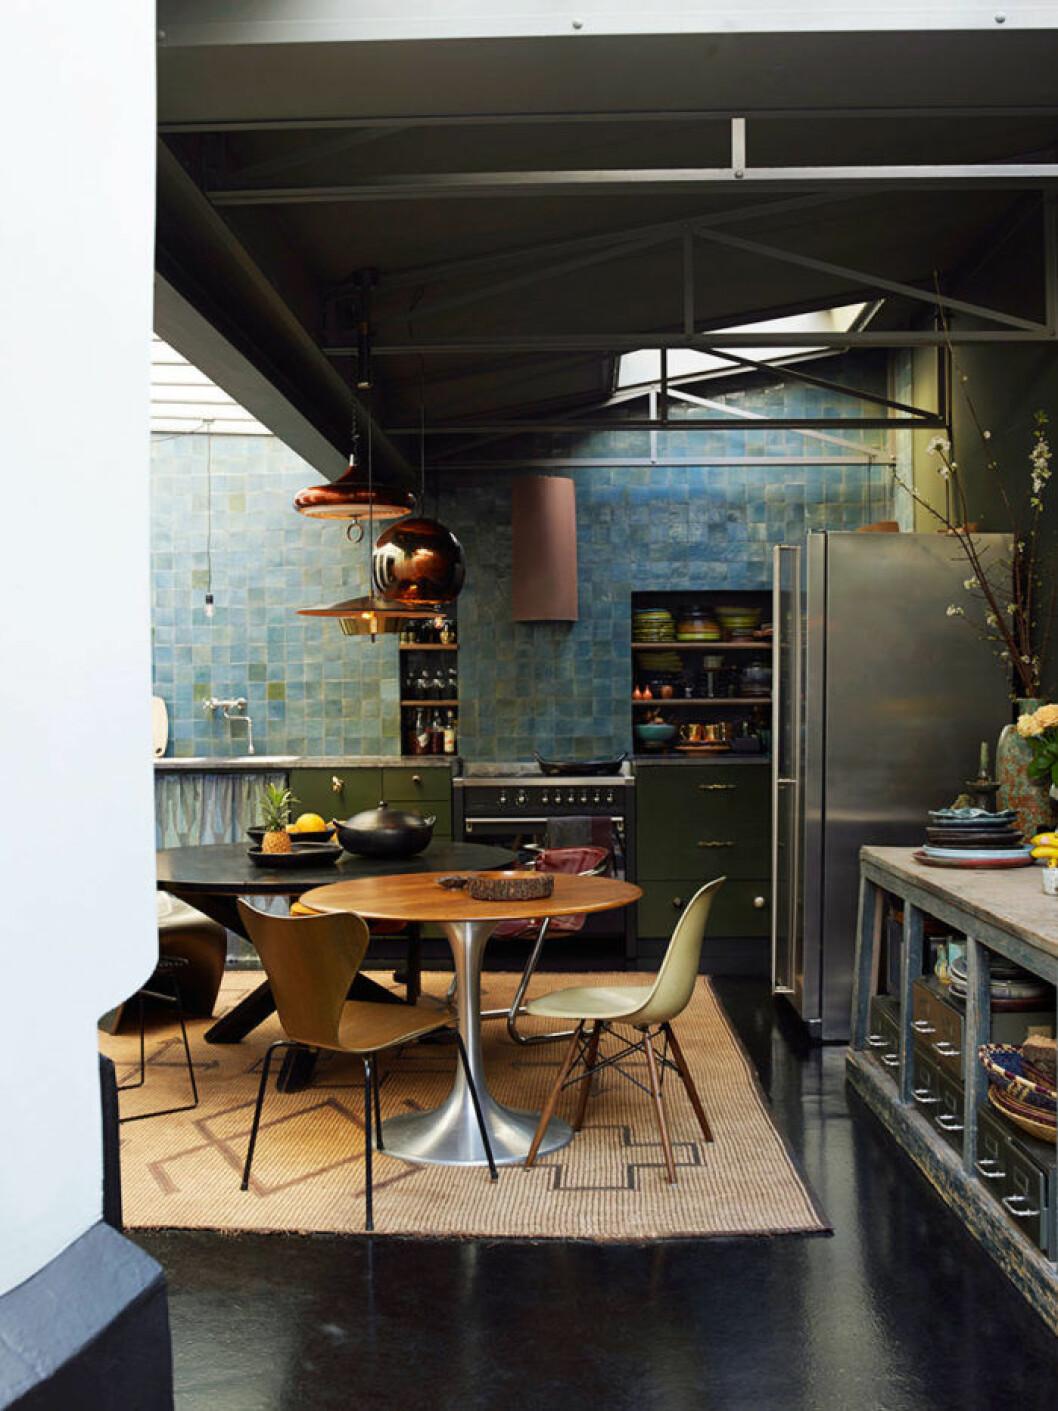 kok_kitchen_tiles_modern_Foto_Gaelle_Le_Boulicaut